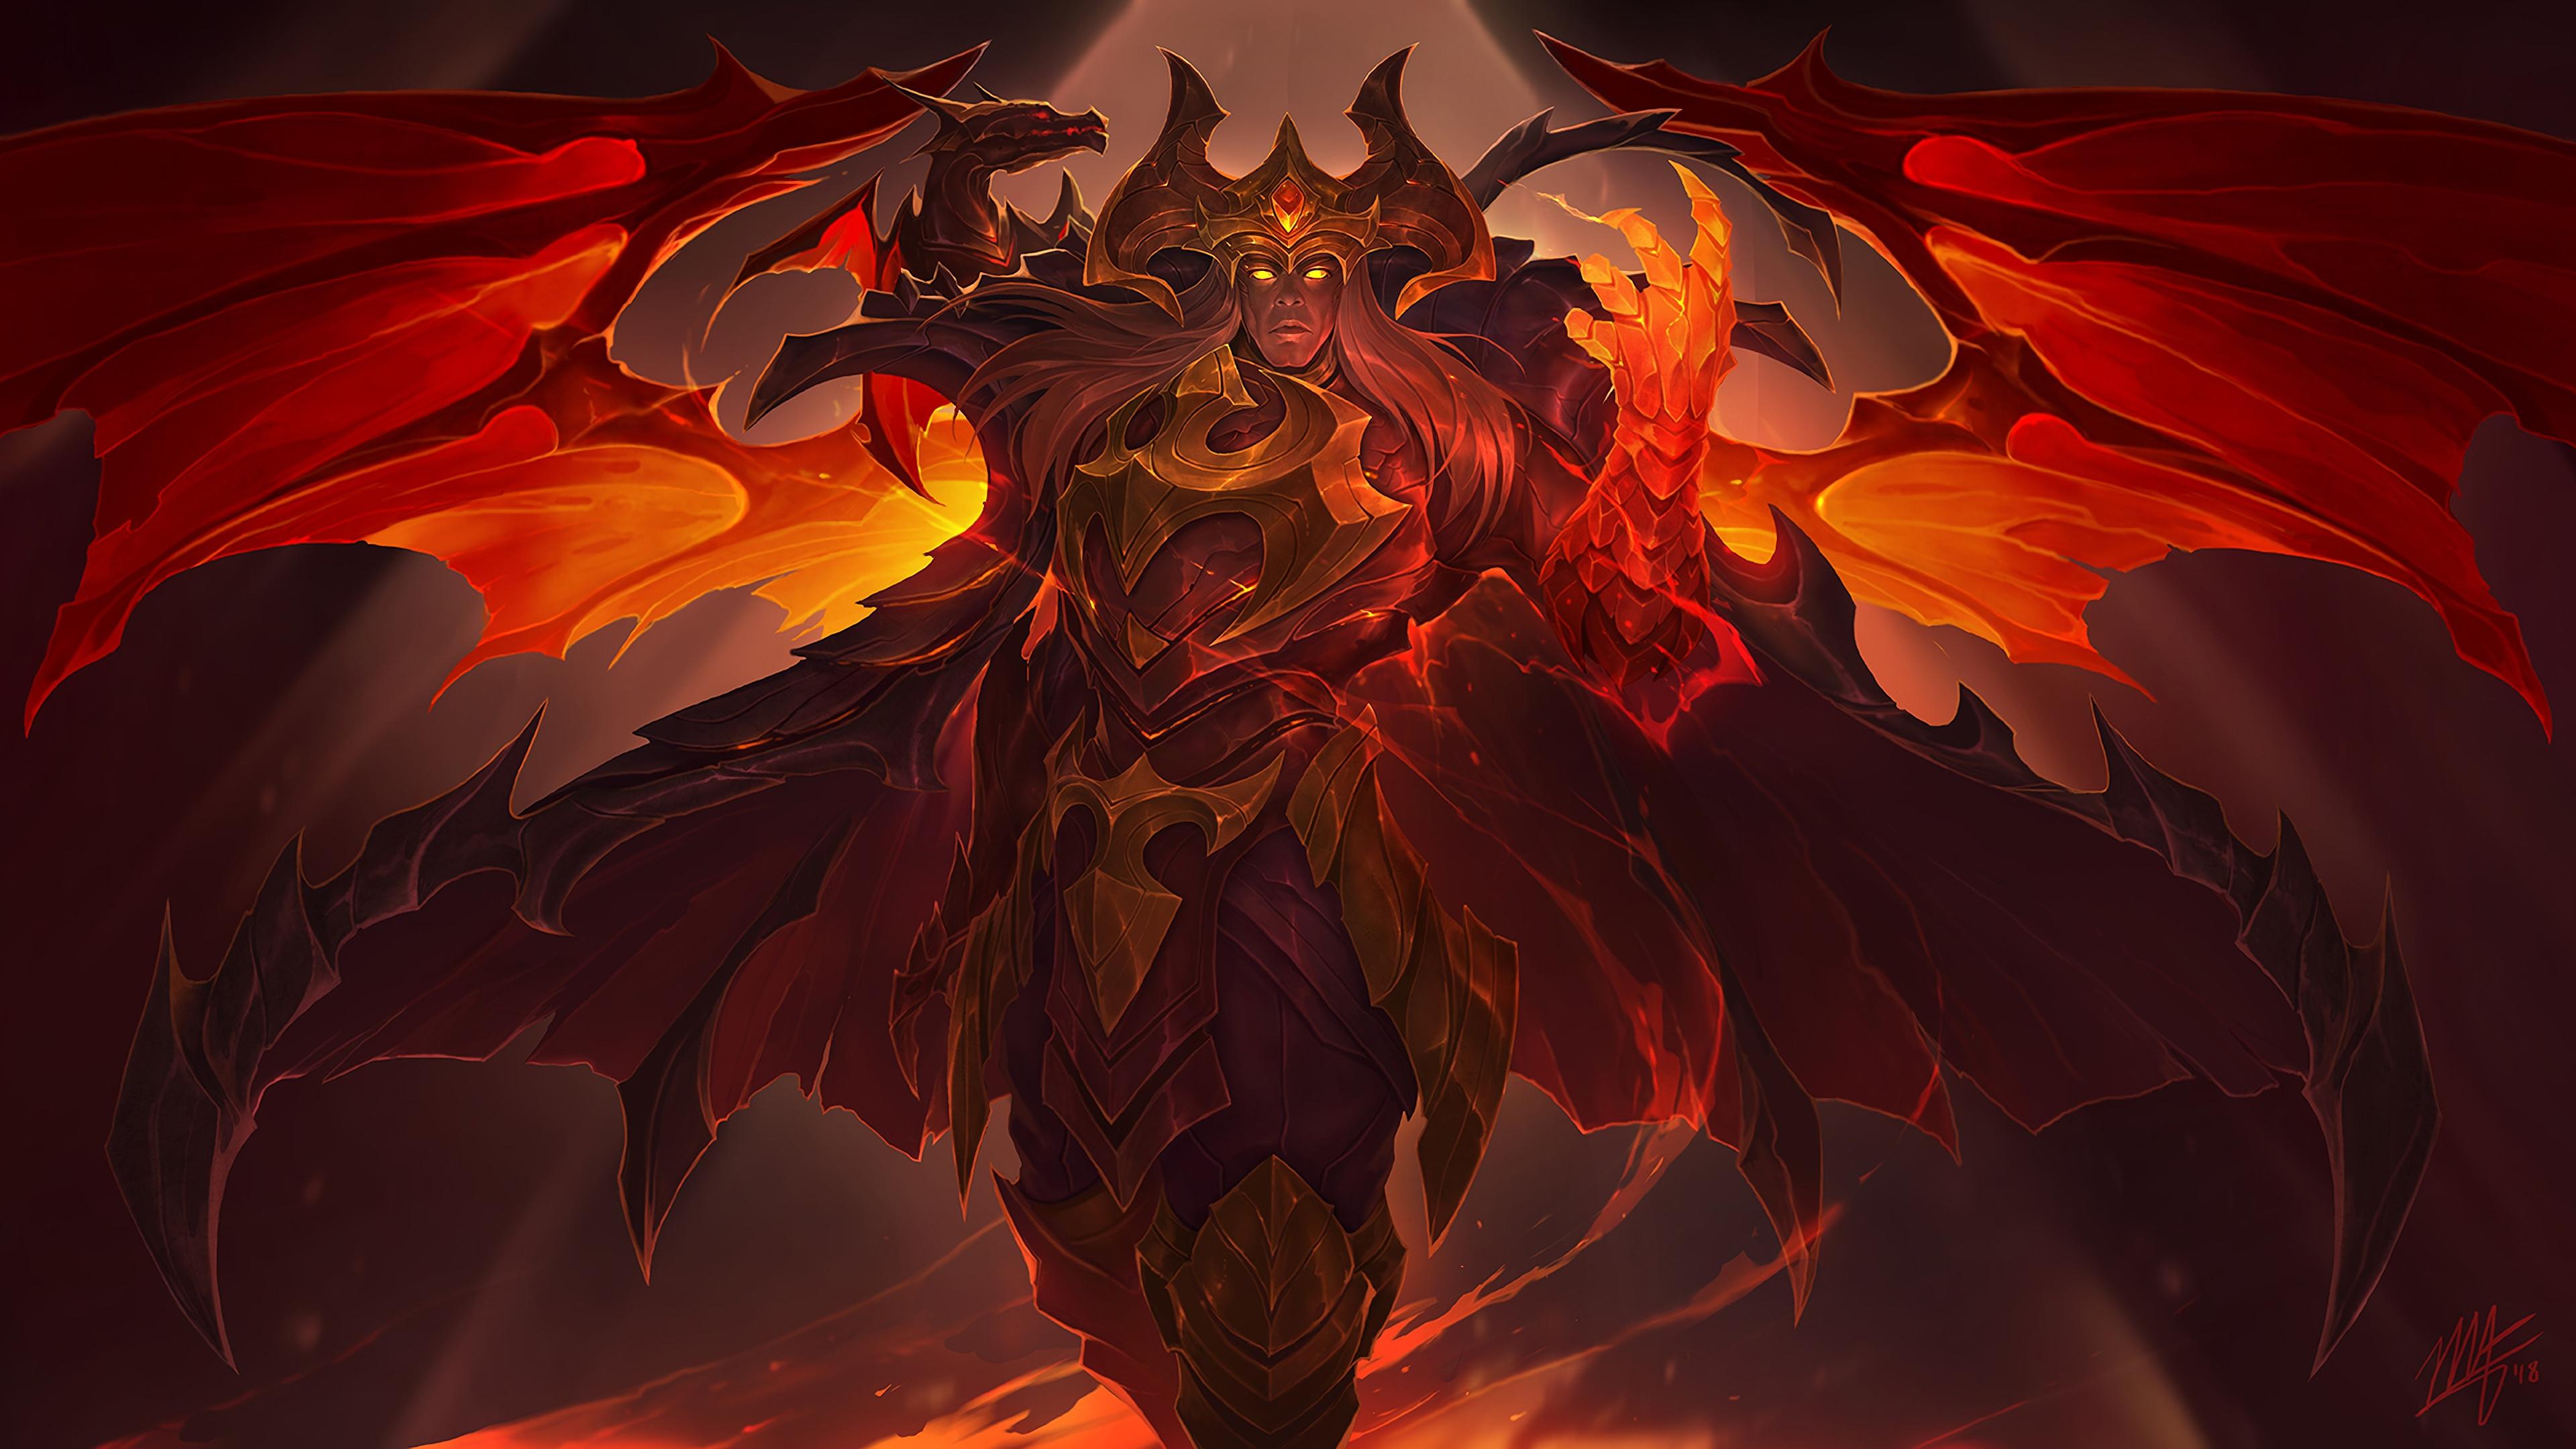 dragon master swain lol art league of legends lol 1574103289 - Dragon Master Swain LoL Art League of Legends lol - Swain, league of legends